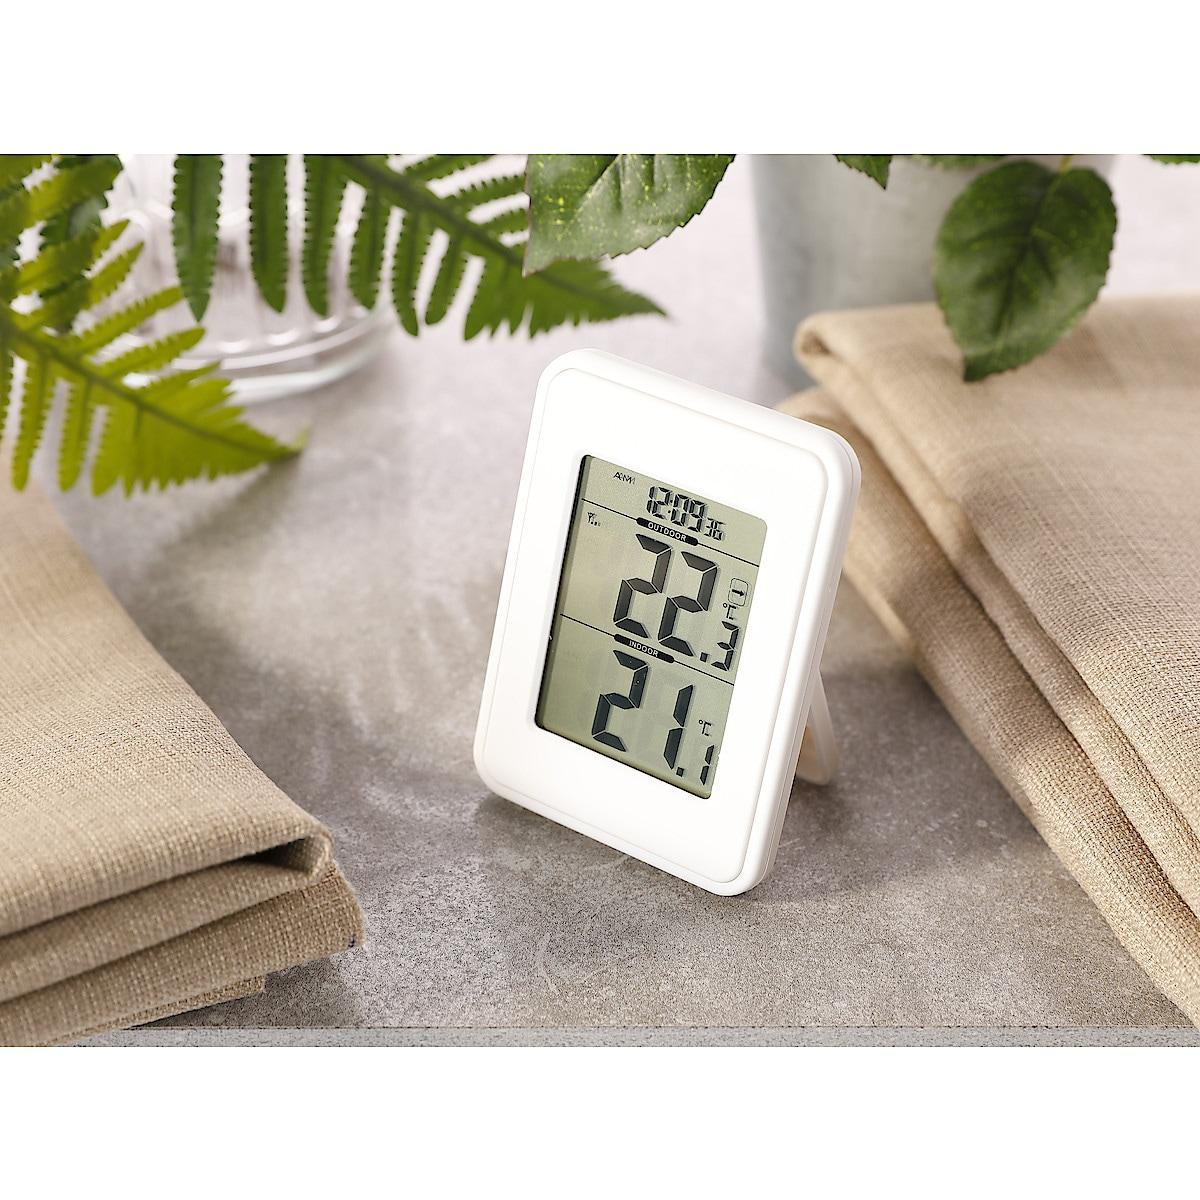 Trådlös termometer ute/inne